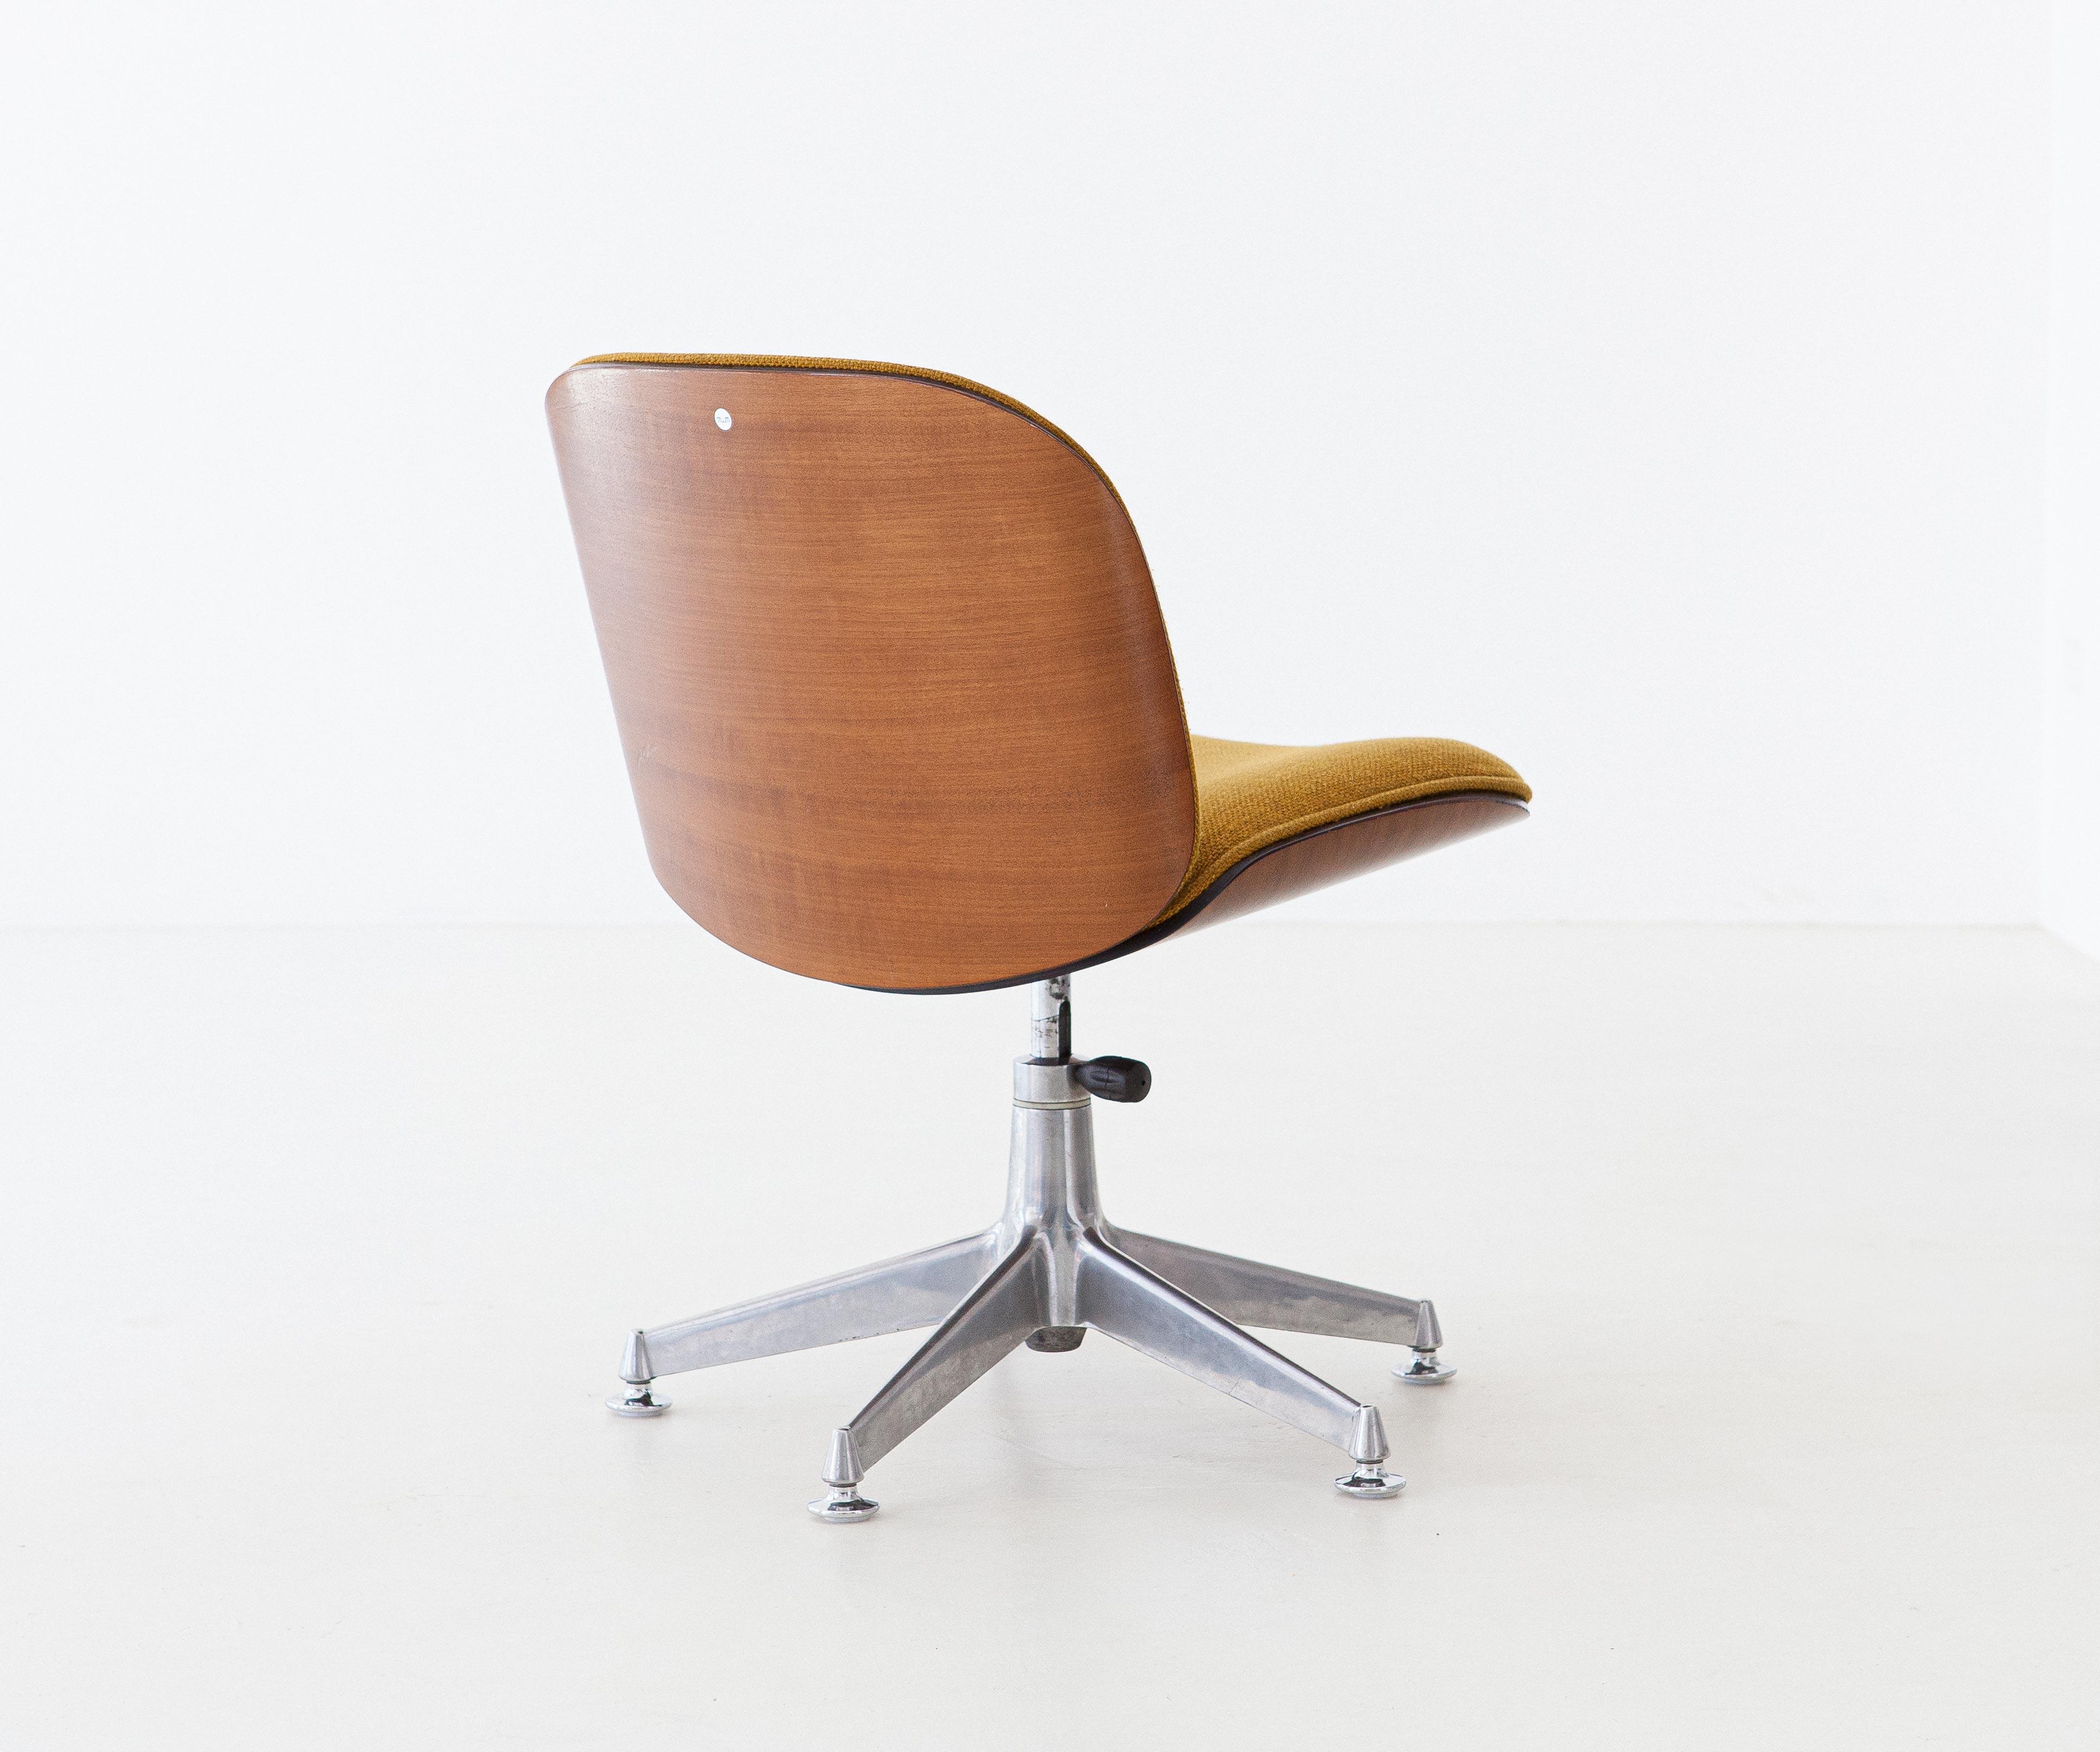 1950s-ico-parisi-for-mim-walnut-swivel-desk-chairs-9-se305